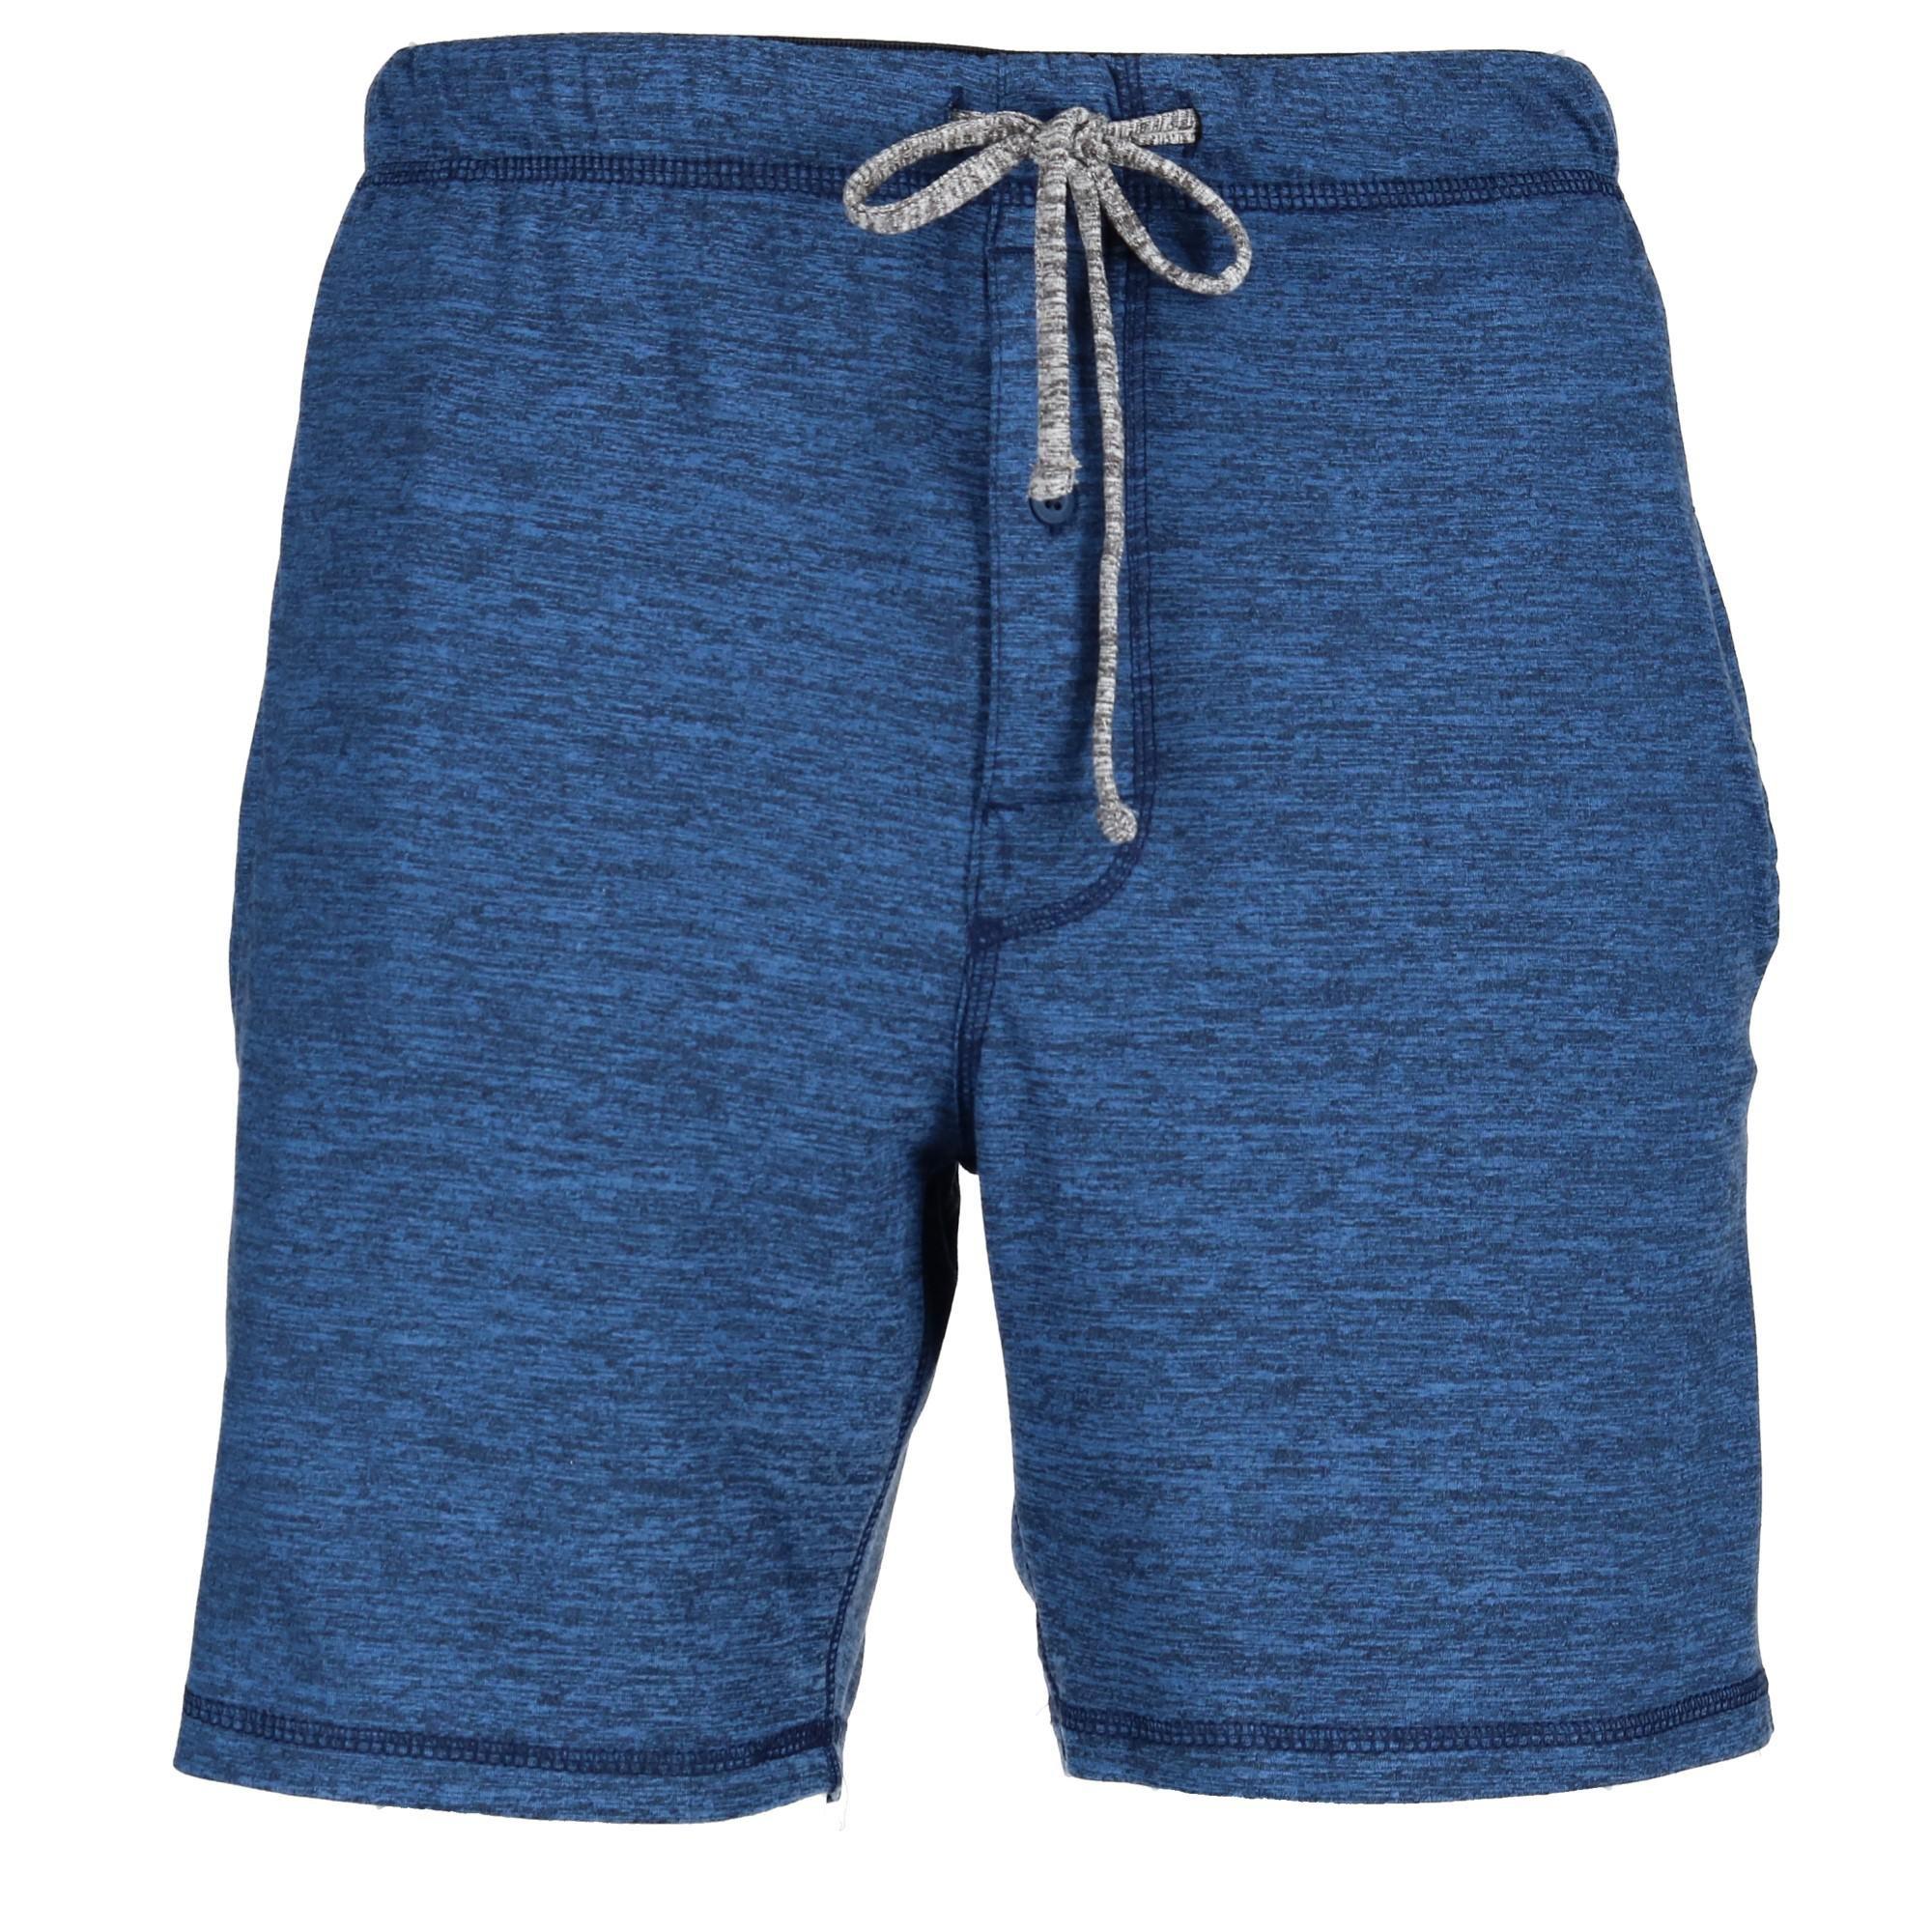 Hanes Men's Big and Tall Knit Sleep Shorts, 4X, Blue